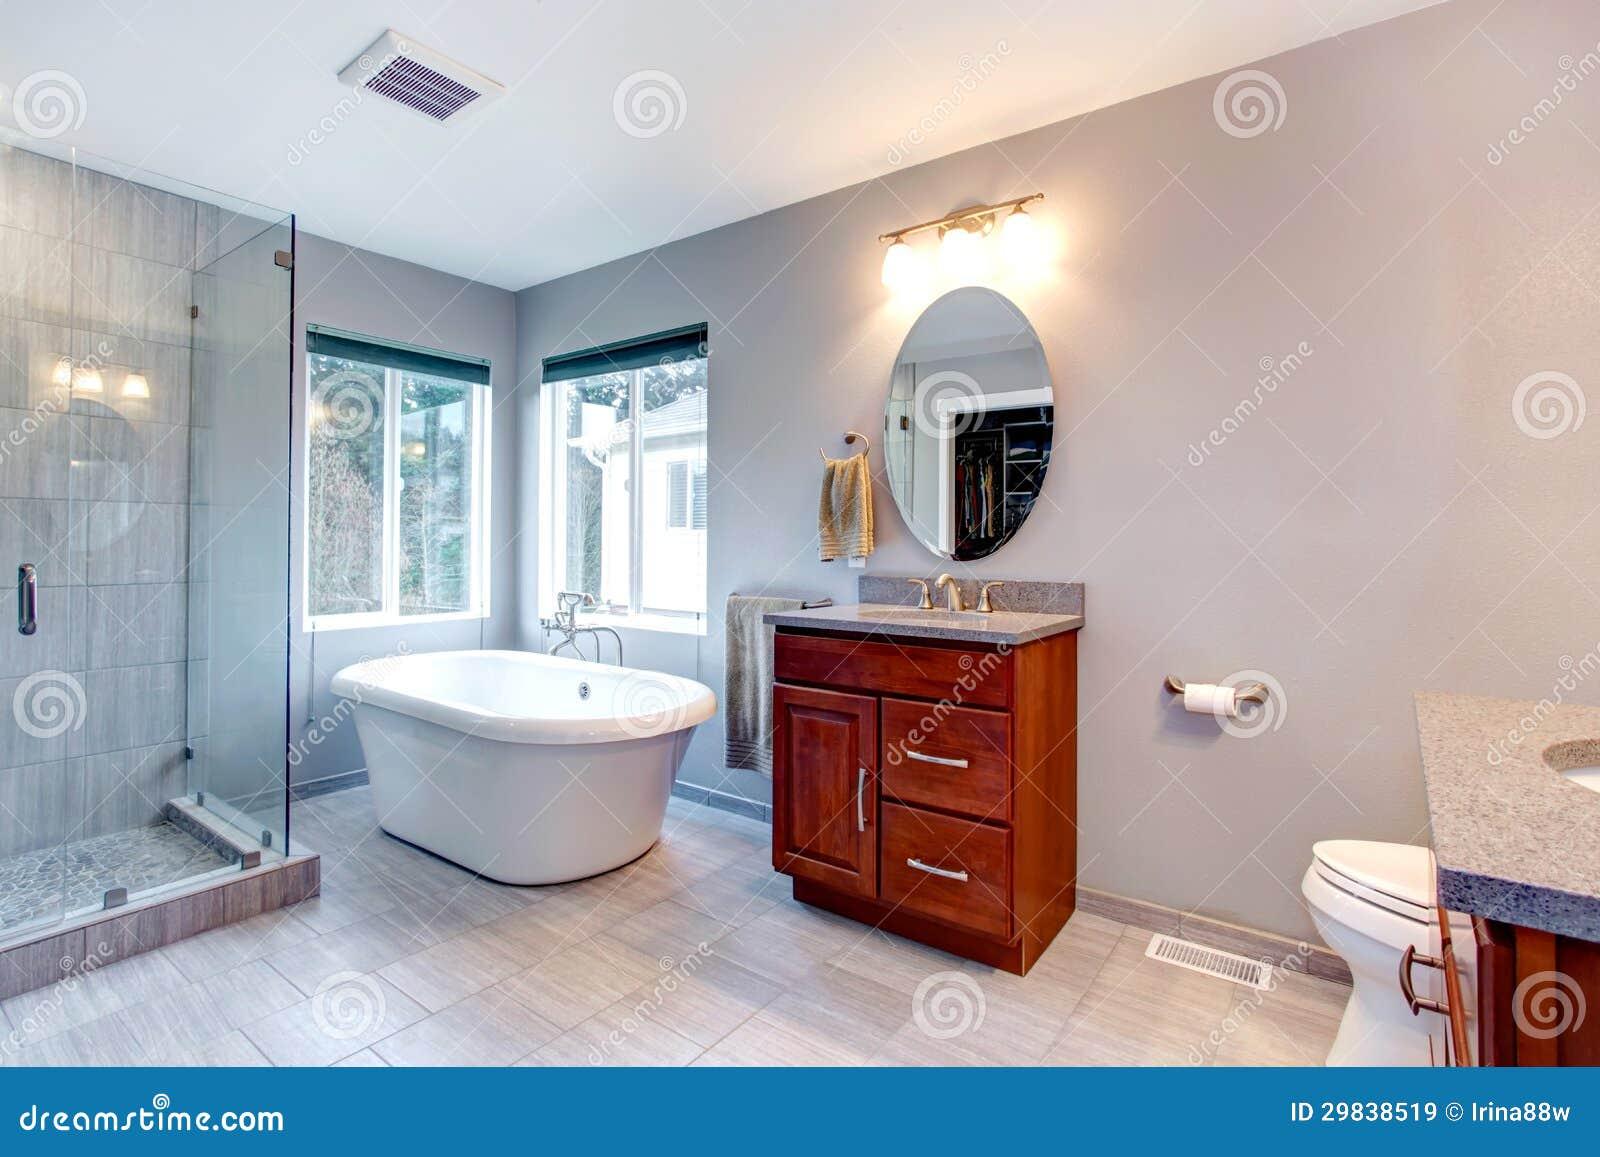 Beautiful Grey New Modern Bathroom Interior Royalty Free Stock Images Image 29838519